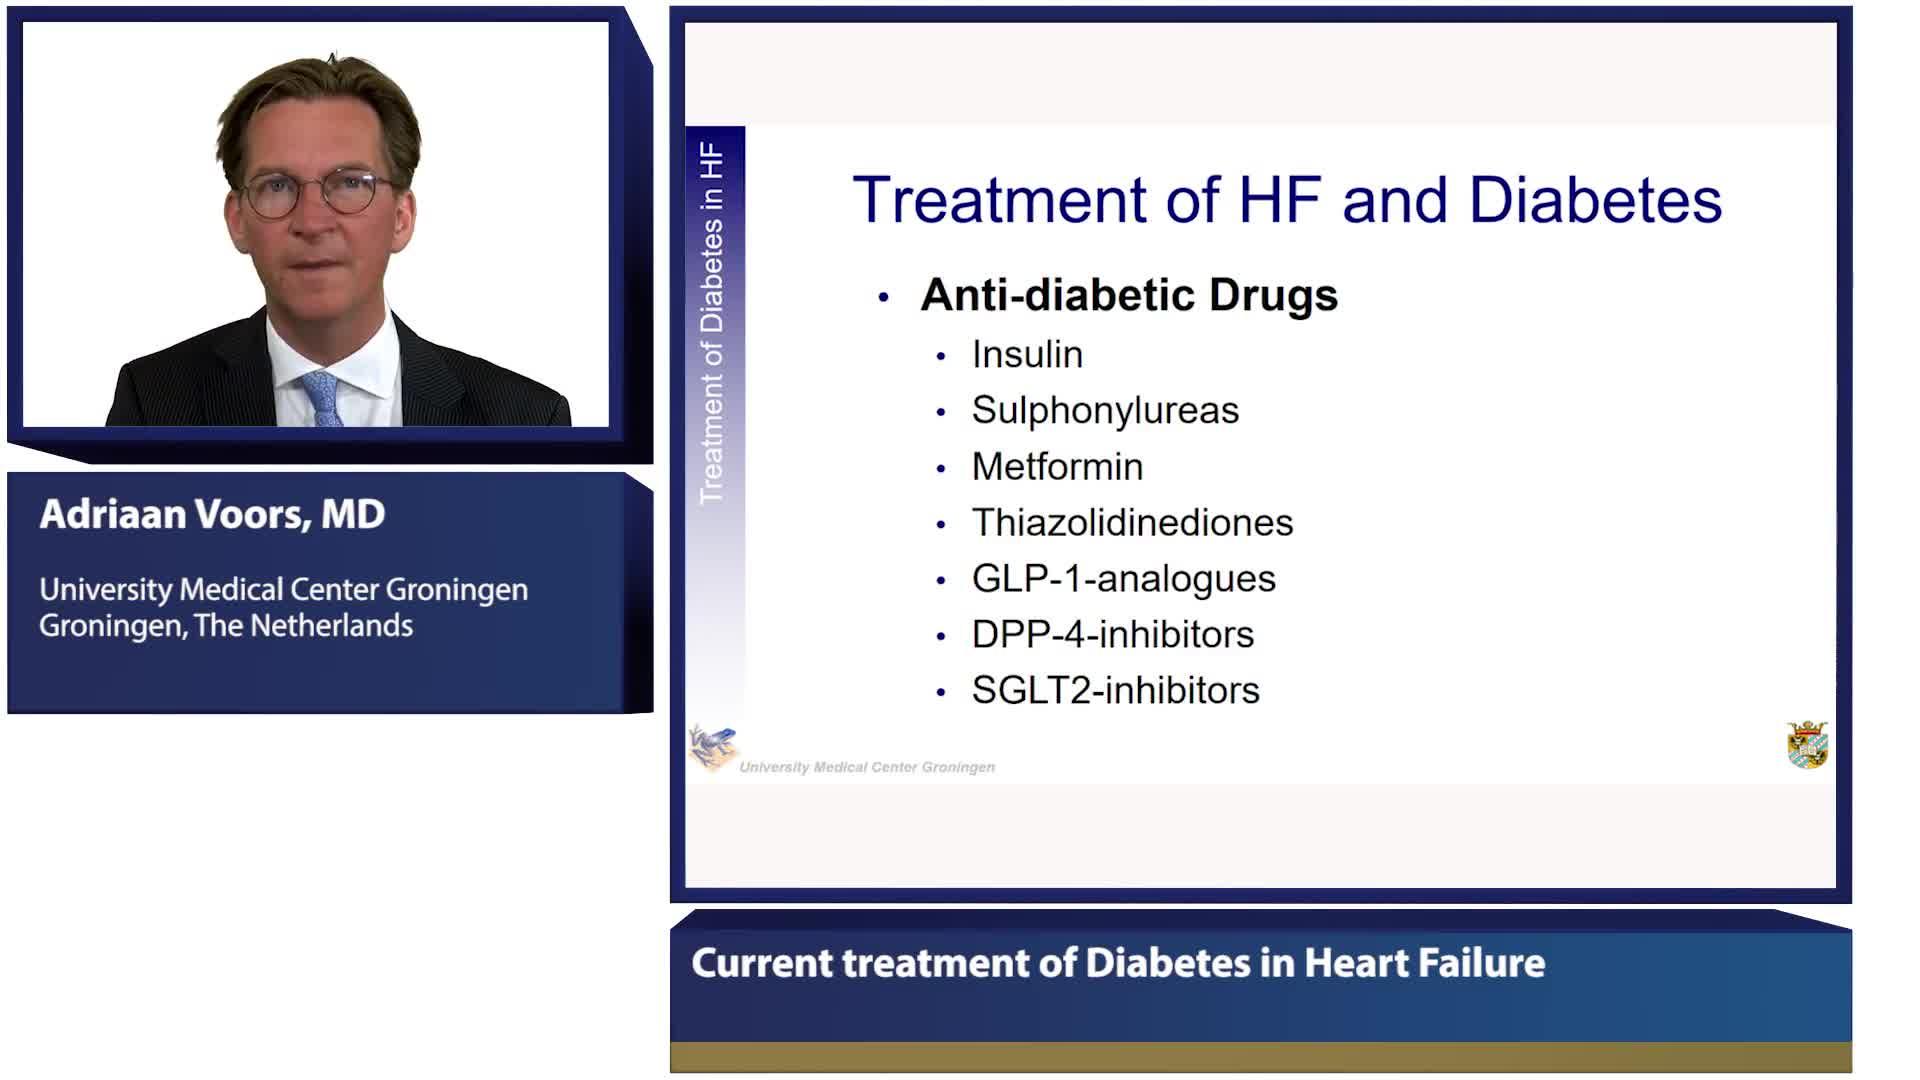 esc heart failure guidelines 2016 pdf